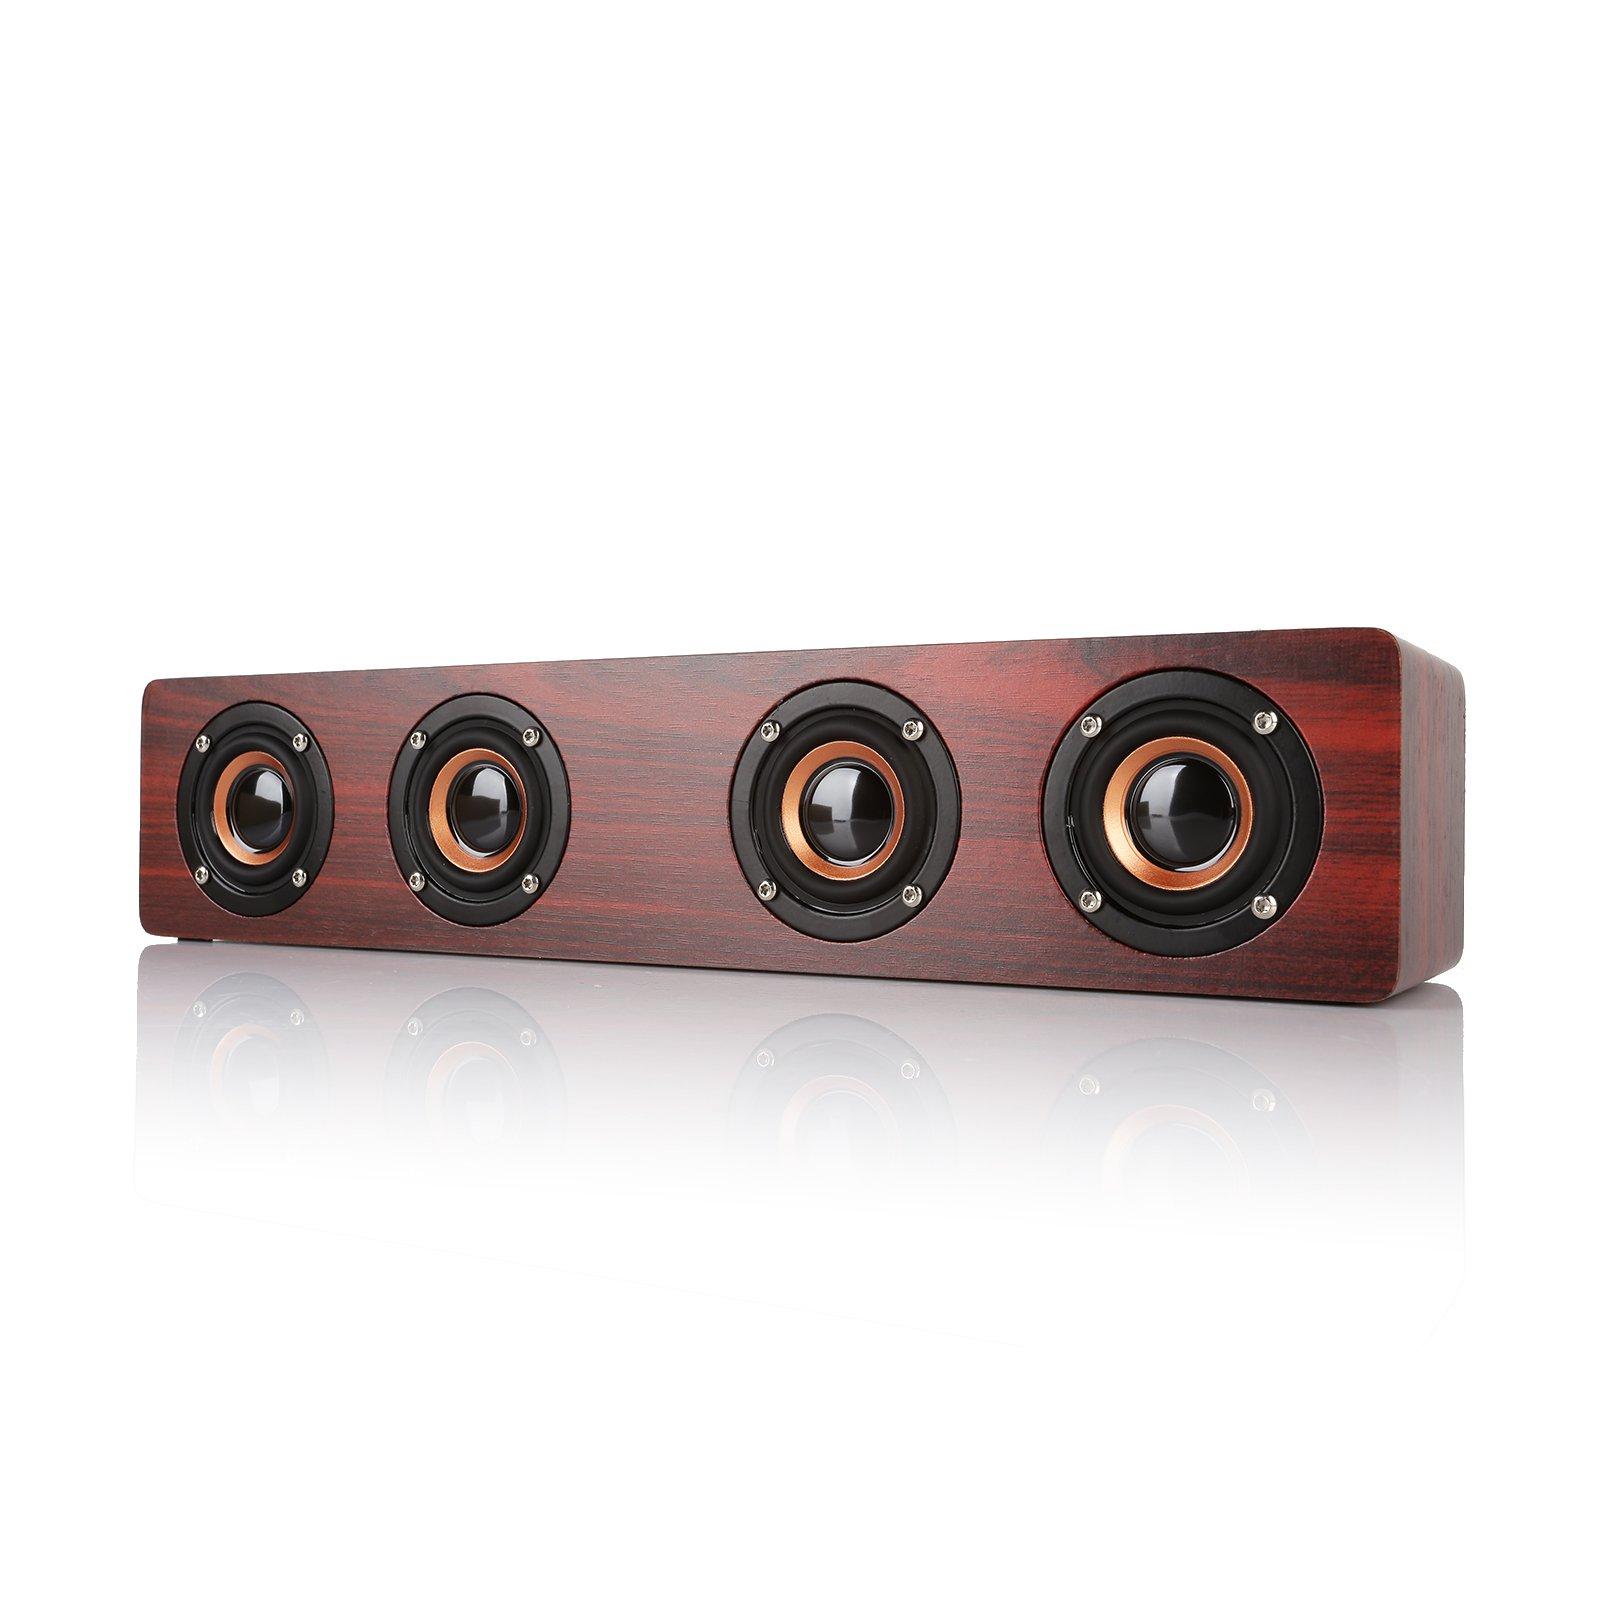 Radioddity RF93 Bluetooth 4.0 Wooden Speaker, 12W Quad Wireless Hi-Fi Loudspeaker, Hands-free Call MP3 Player Supports TF Card 3000mAh Red Wood